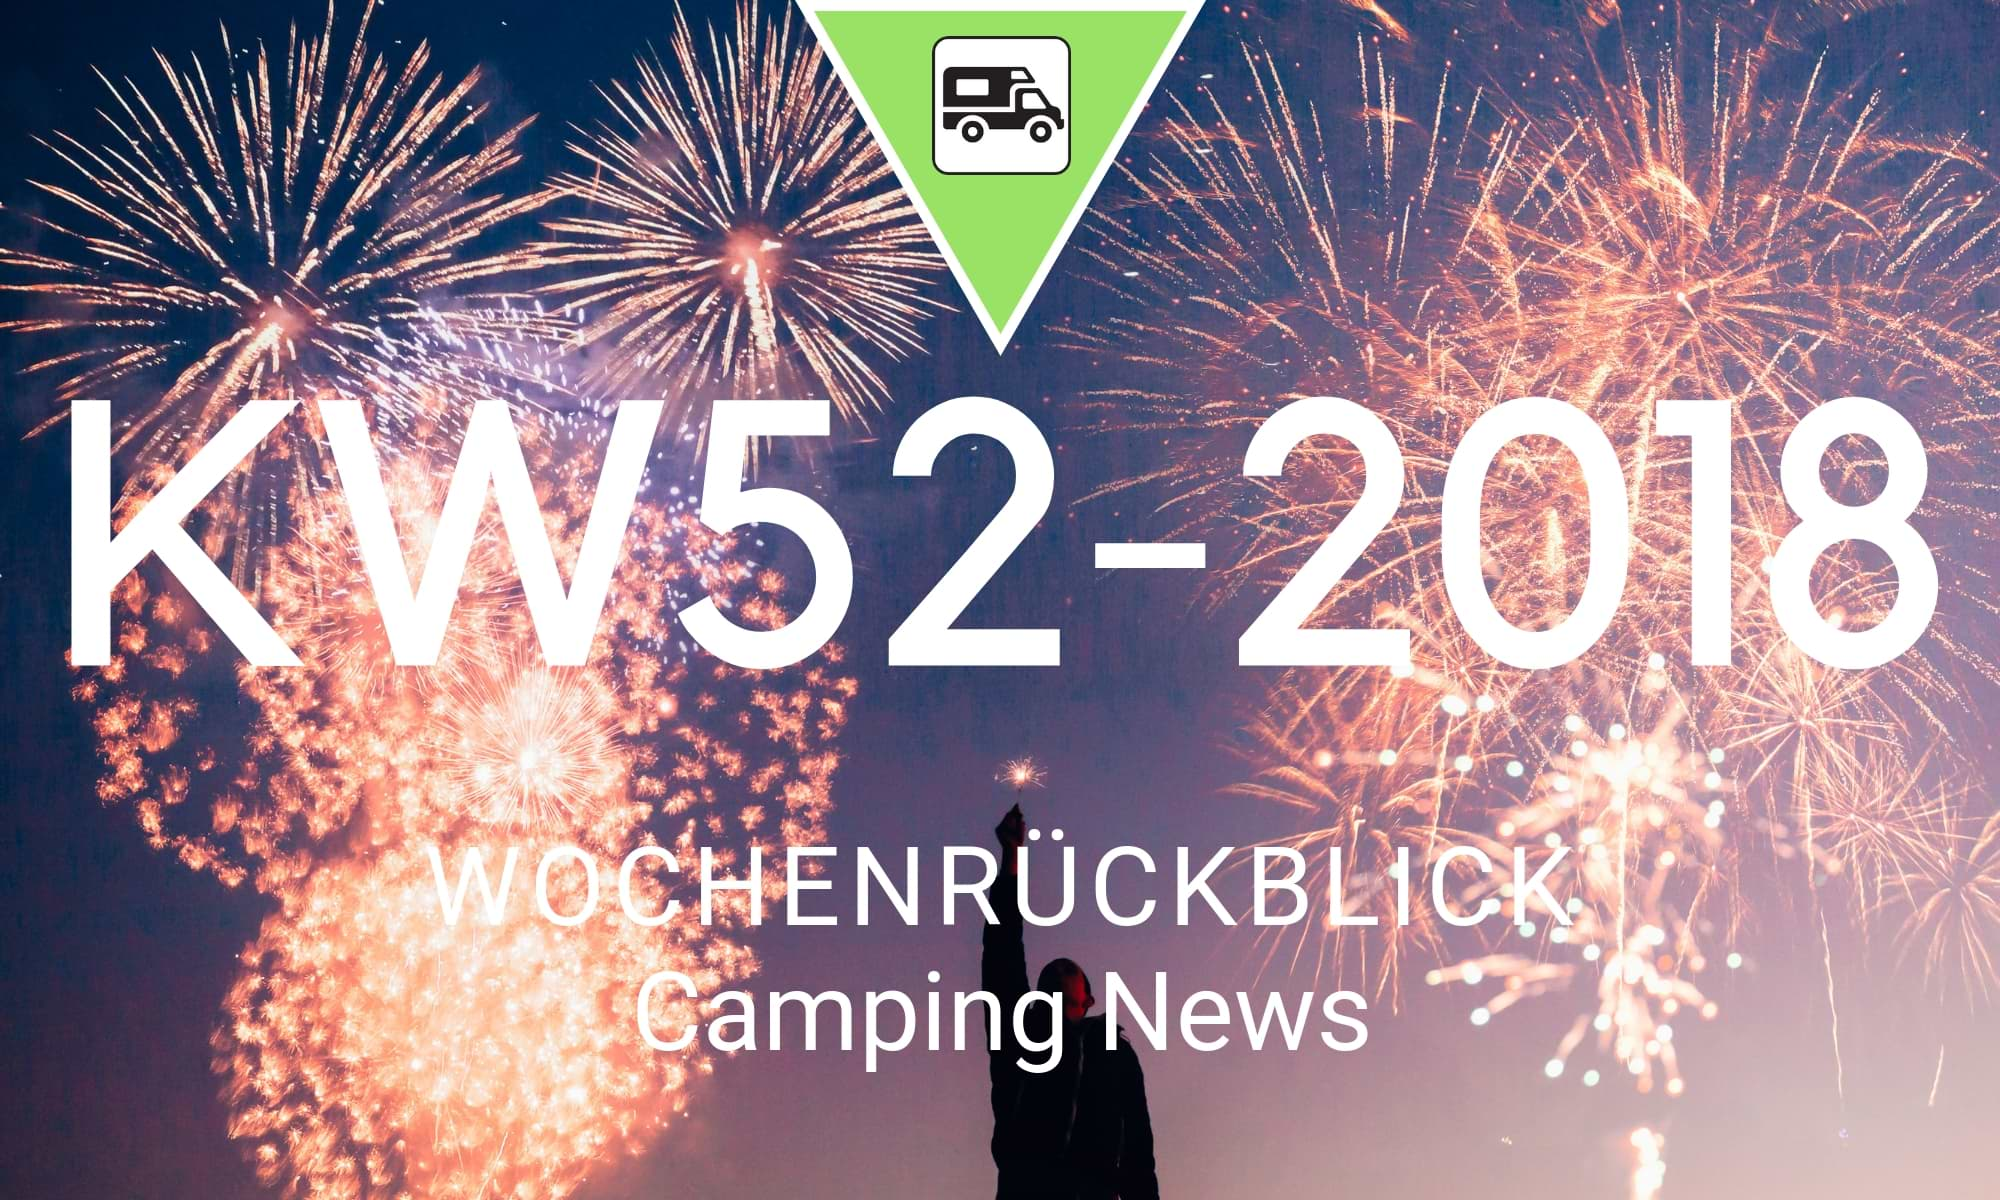 Wochenrückblick Camping News KW52-2018